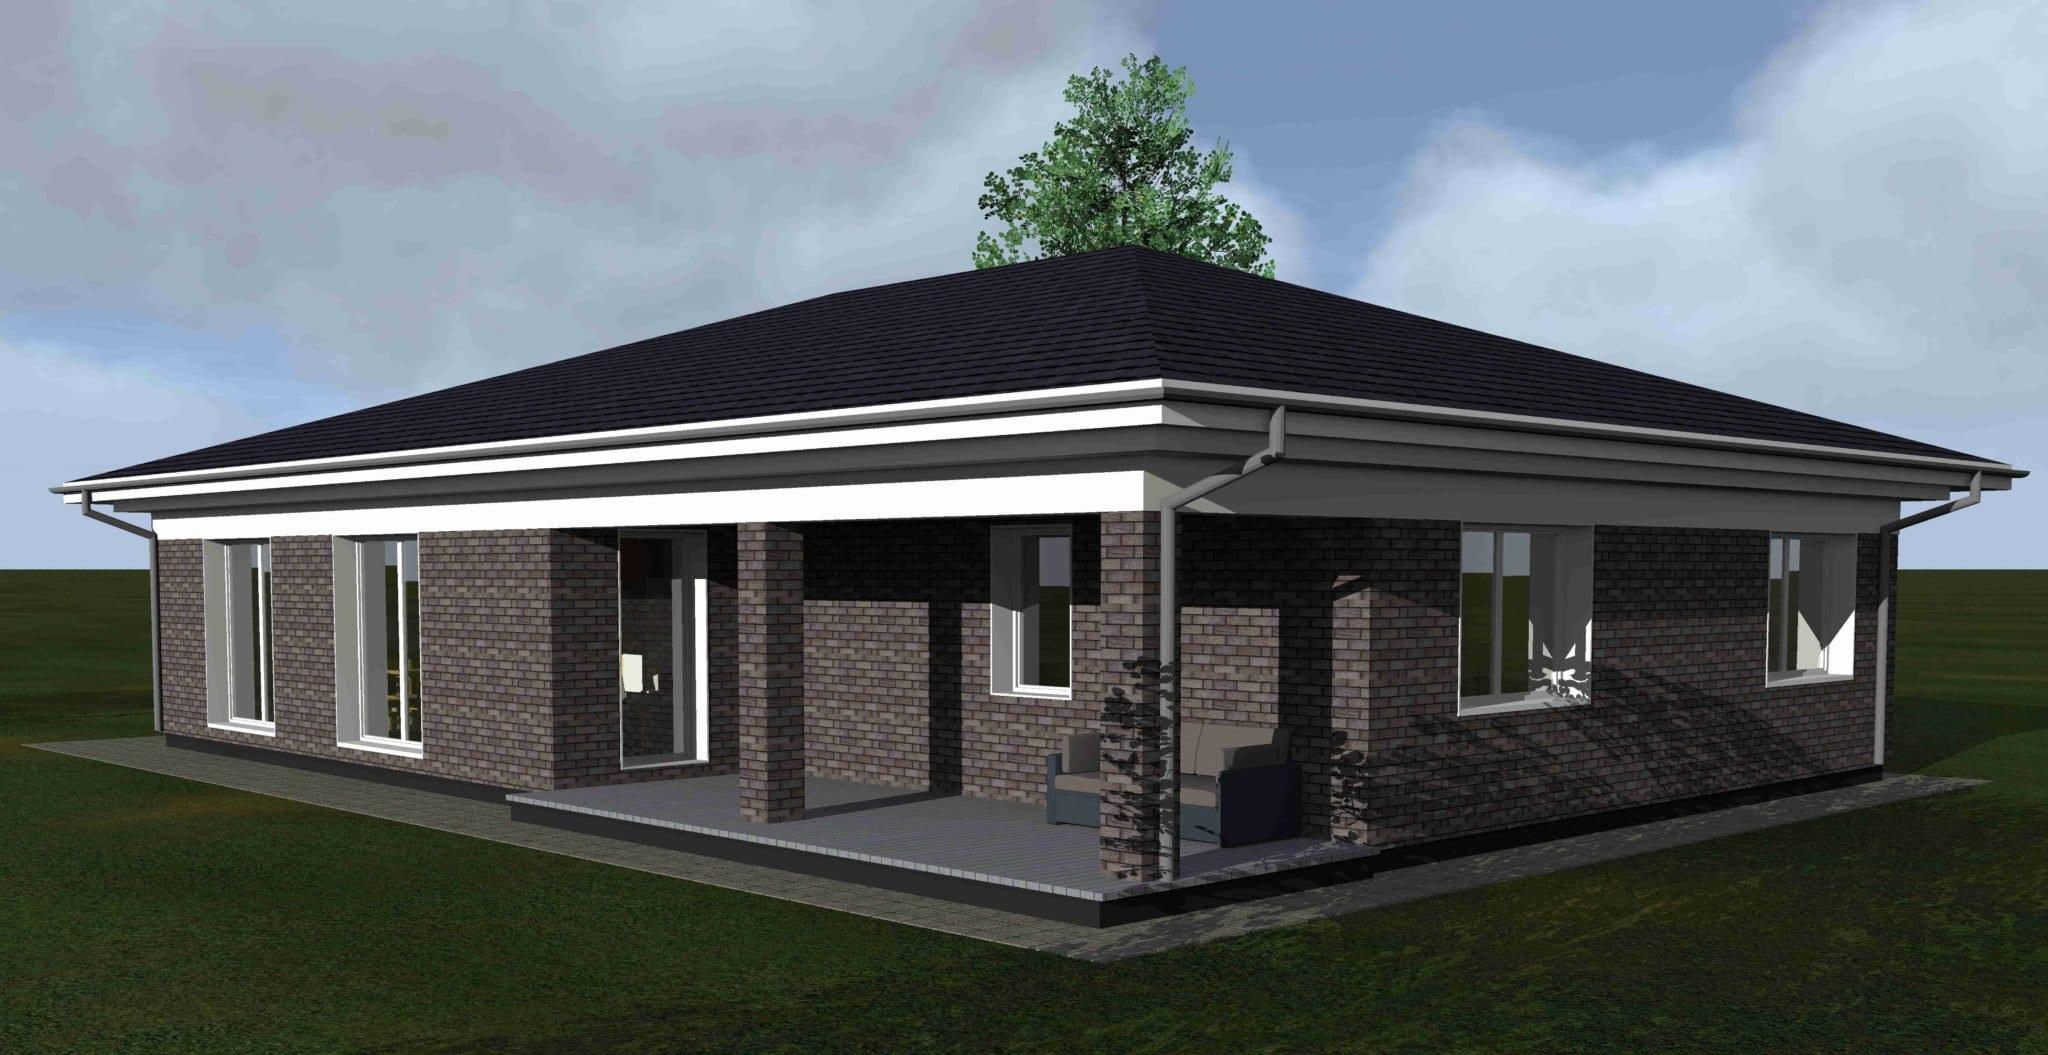 Vienbučio gyvenamojo namo projektas